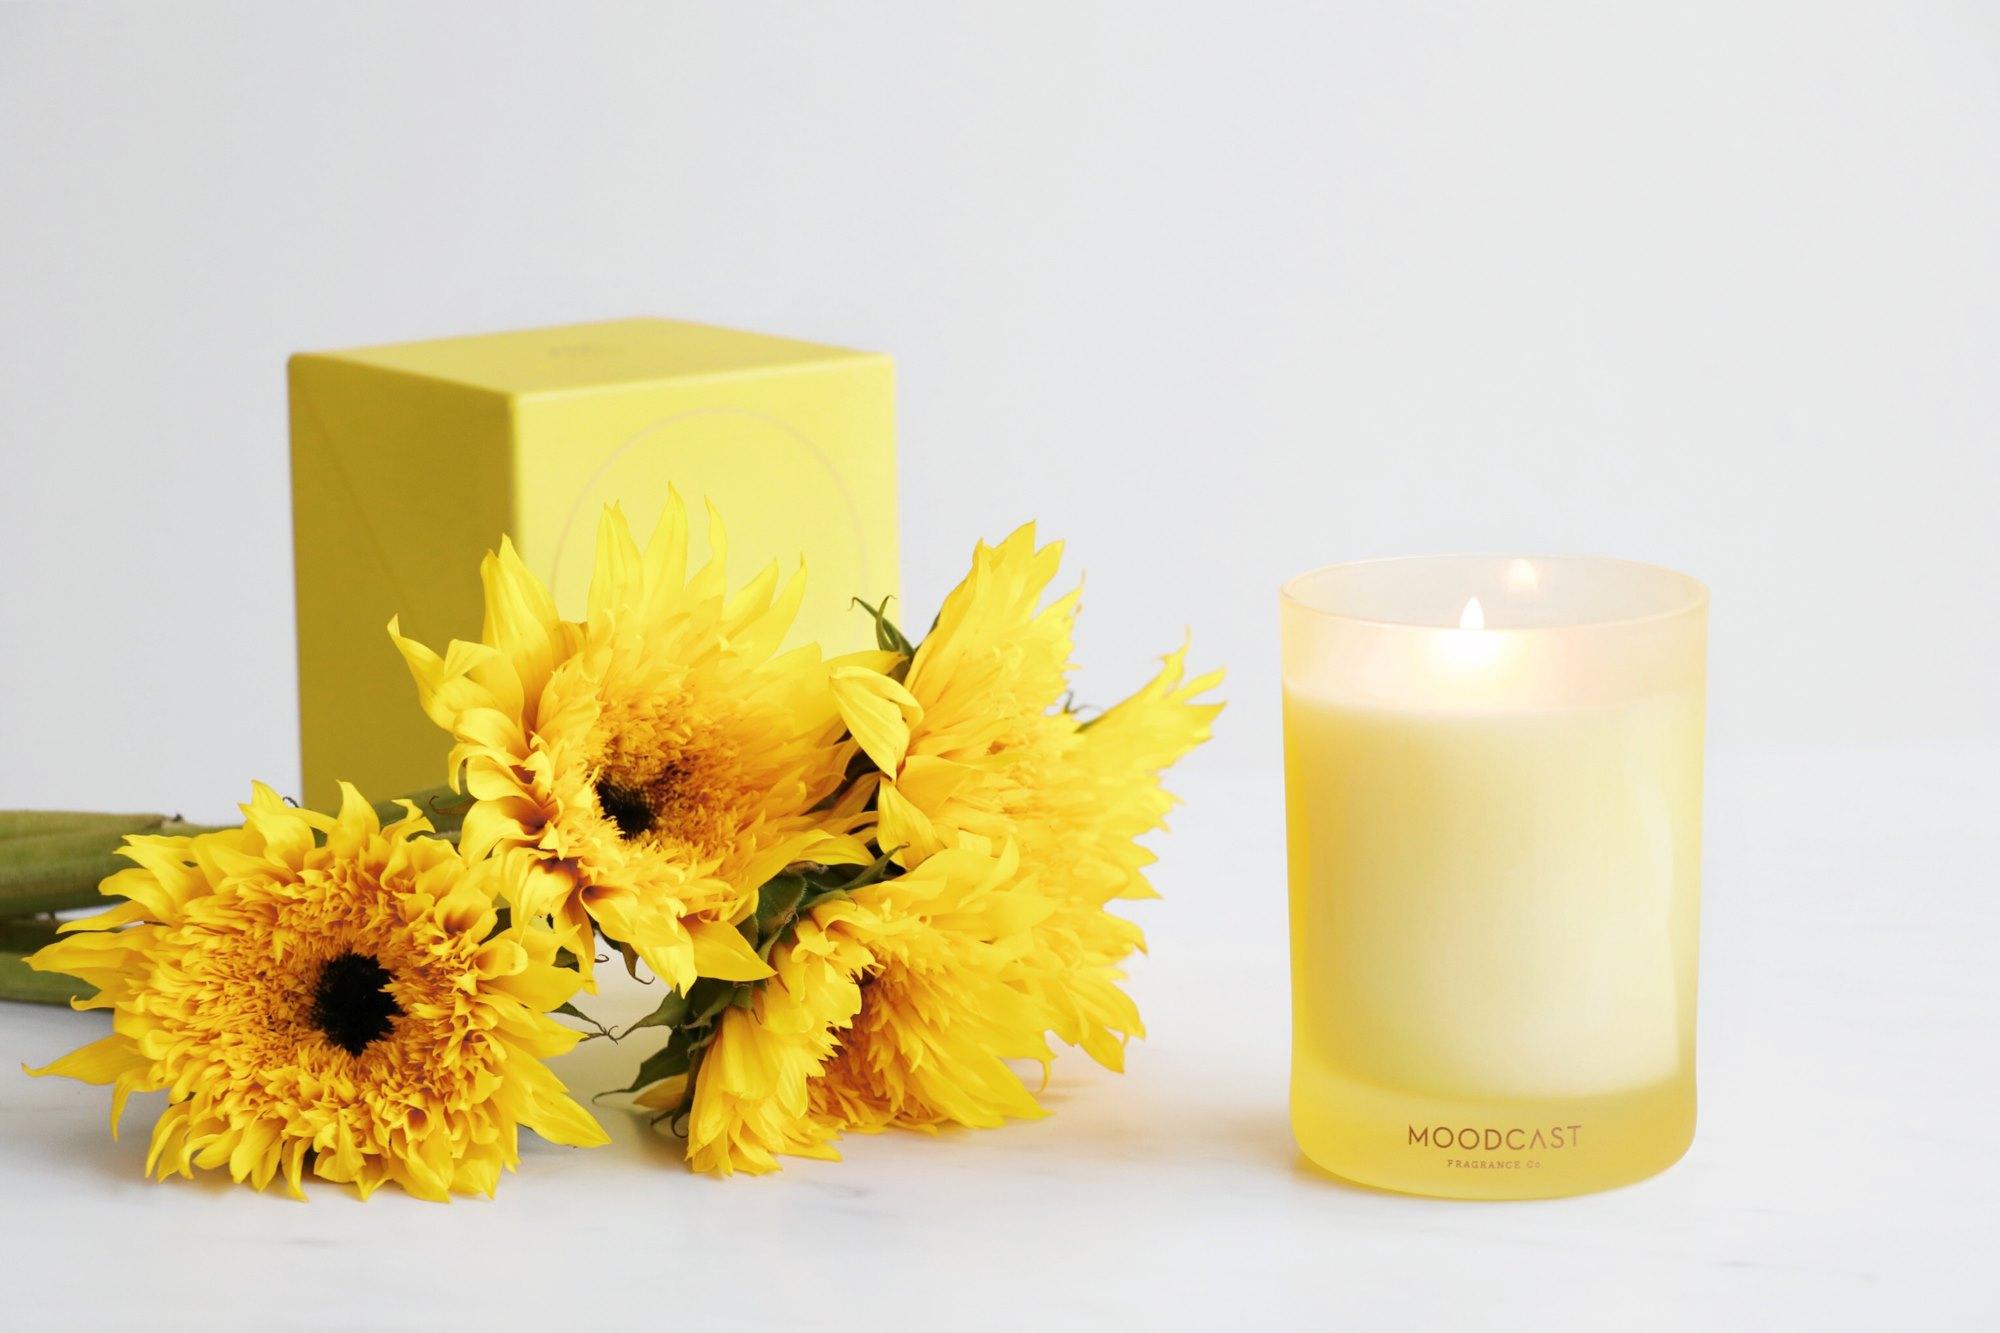 moodcast candle